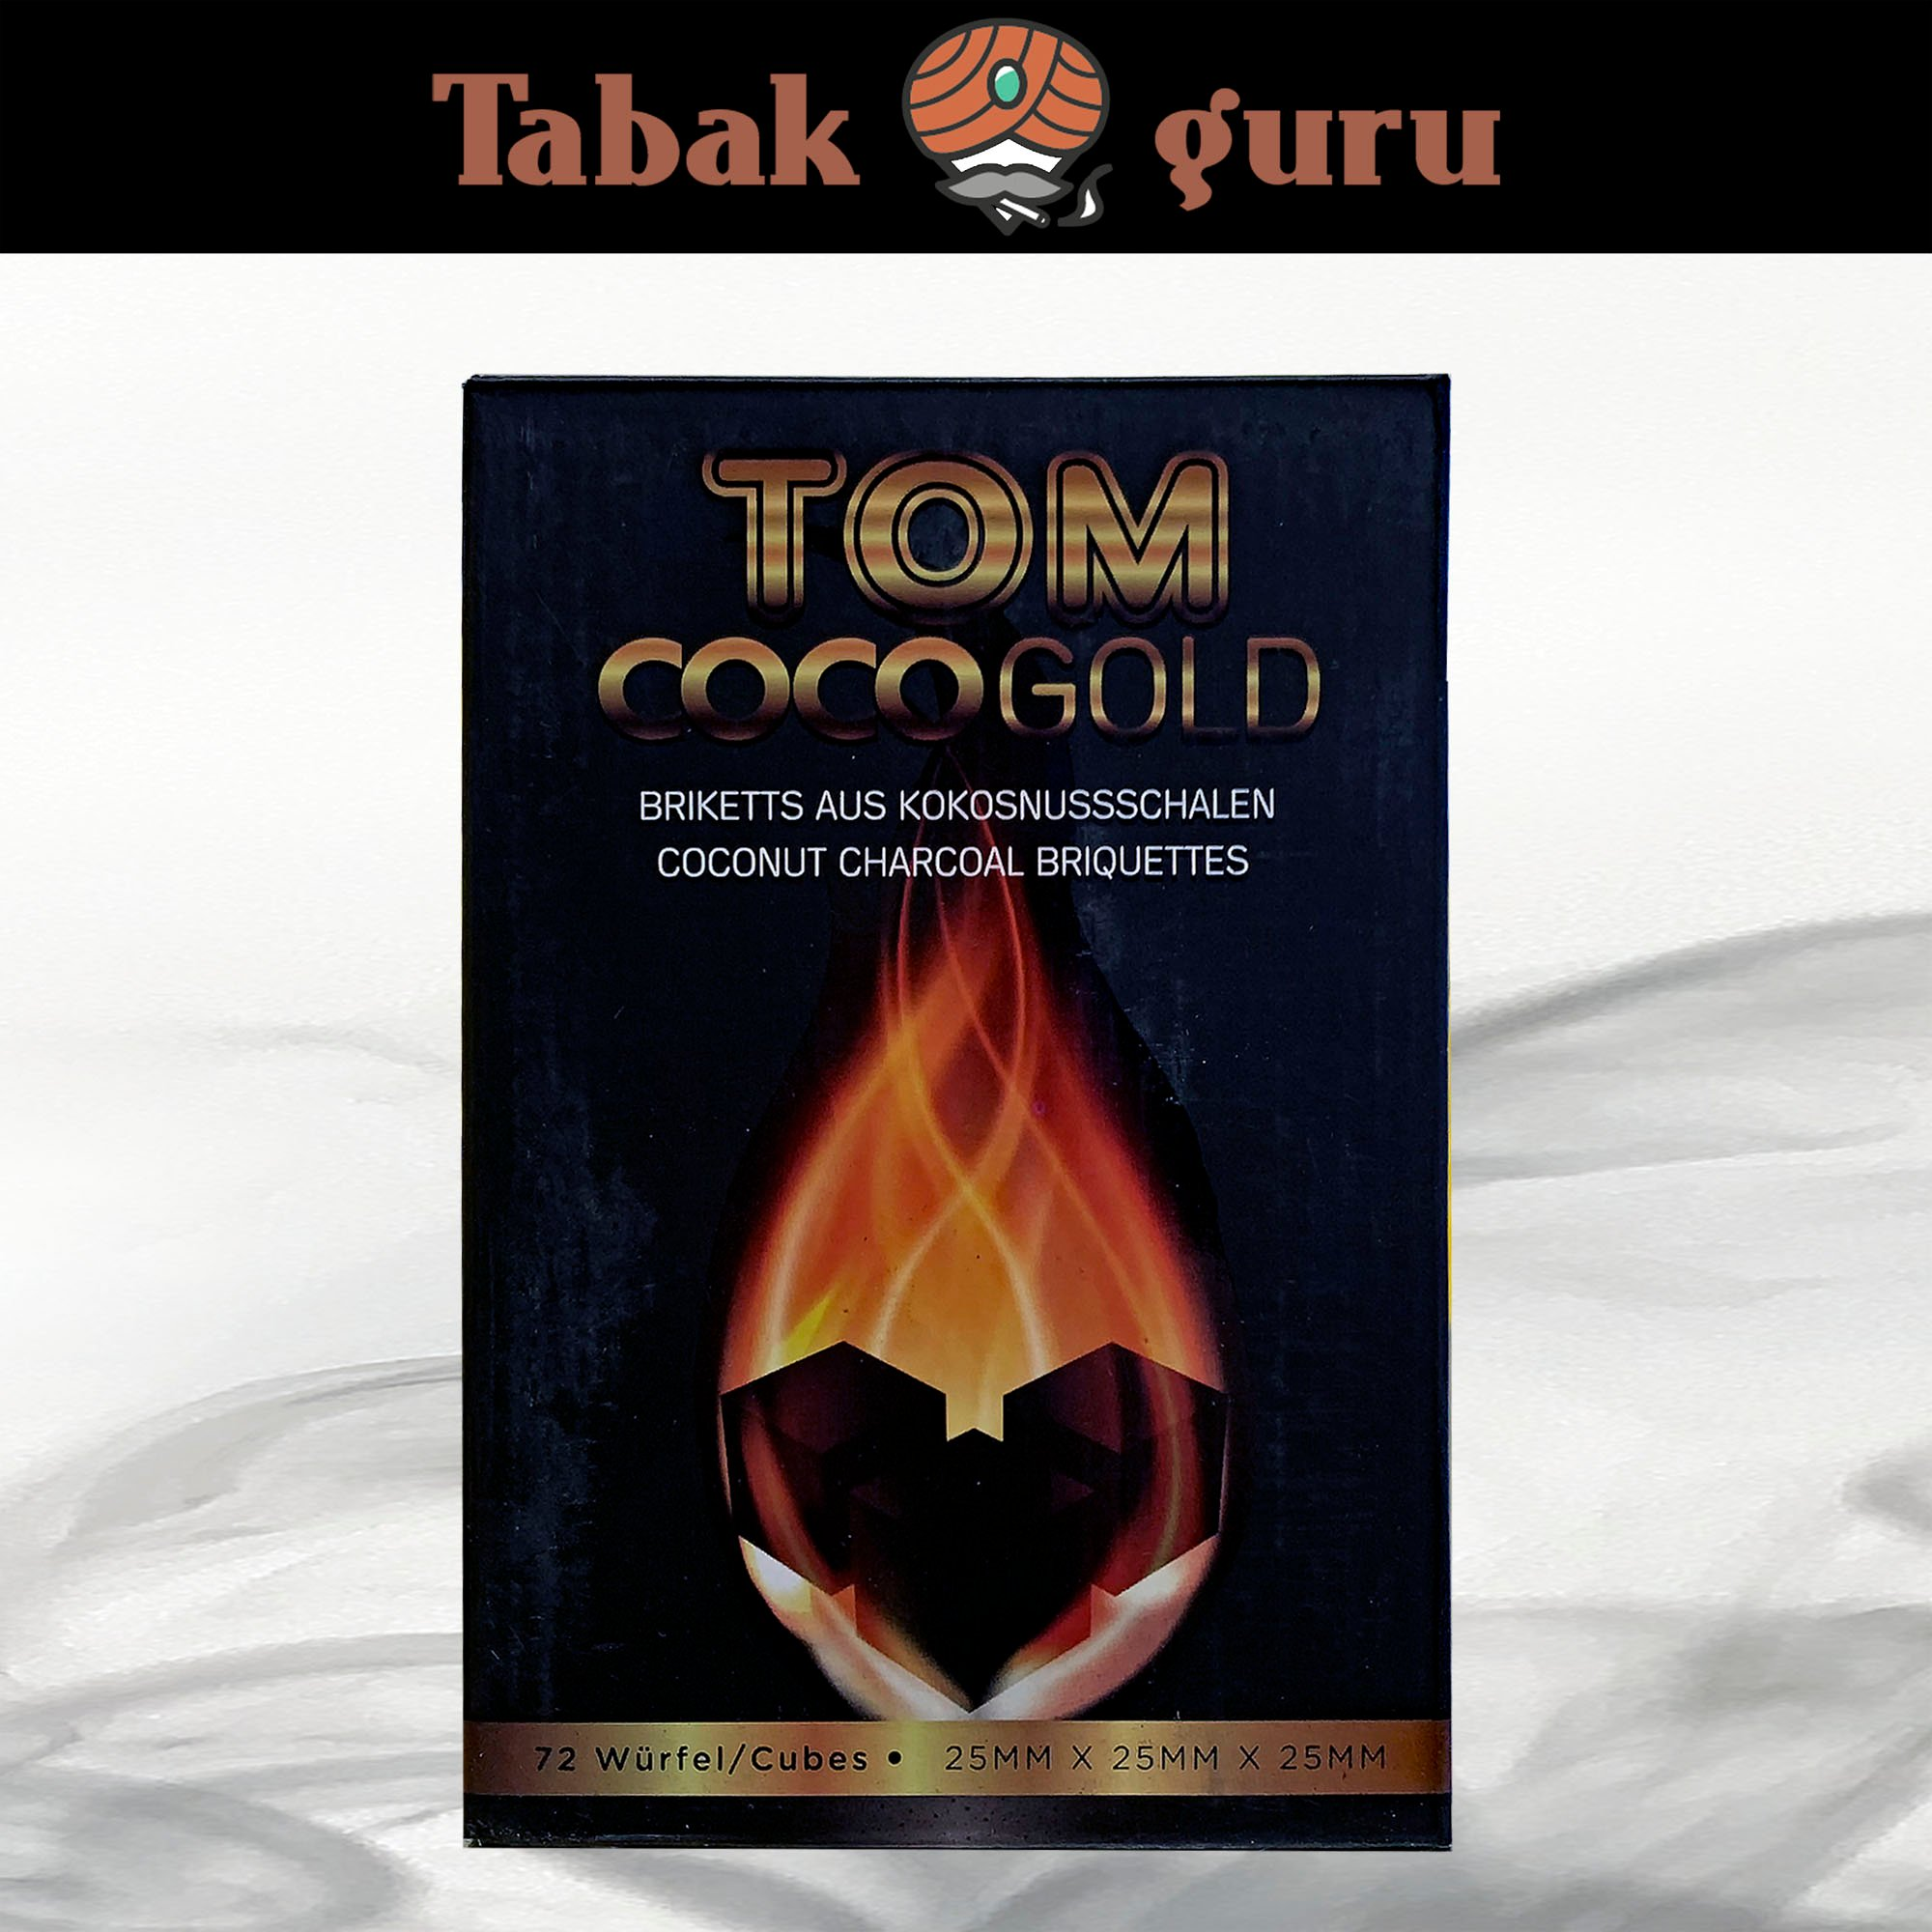 Tom Cococha CocoGold Shishakohle 1kg = 72 Stück